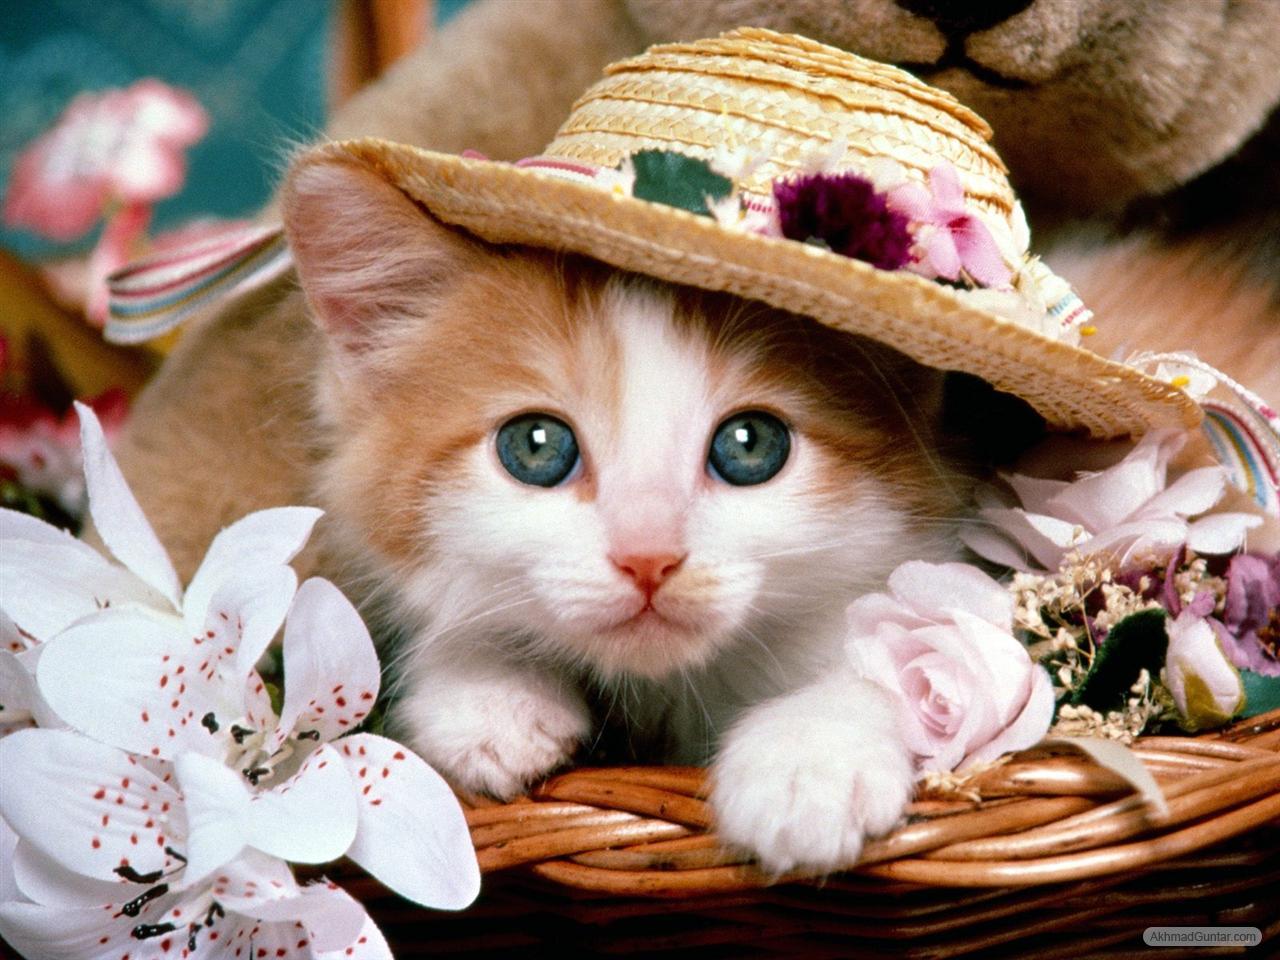 Gambar Kucing Comel Dan Lucu Kucingcomel Com